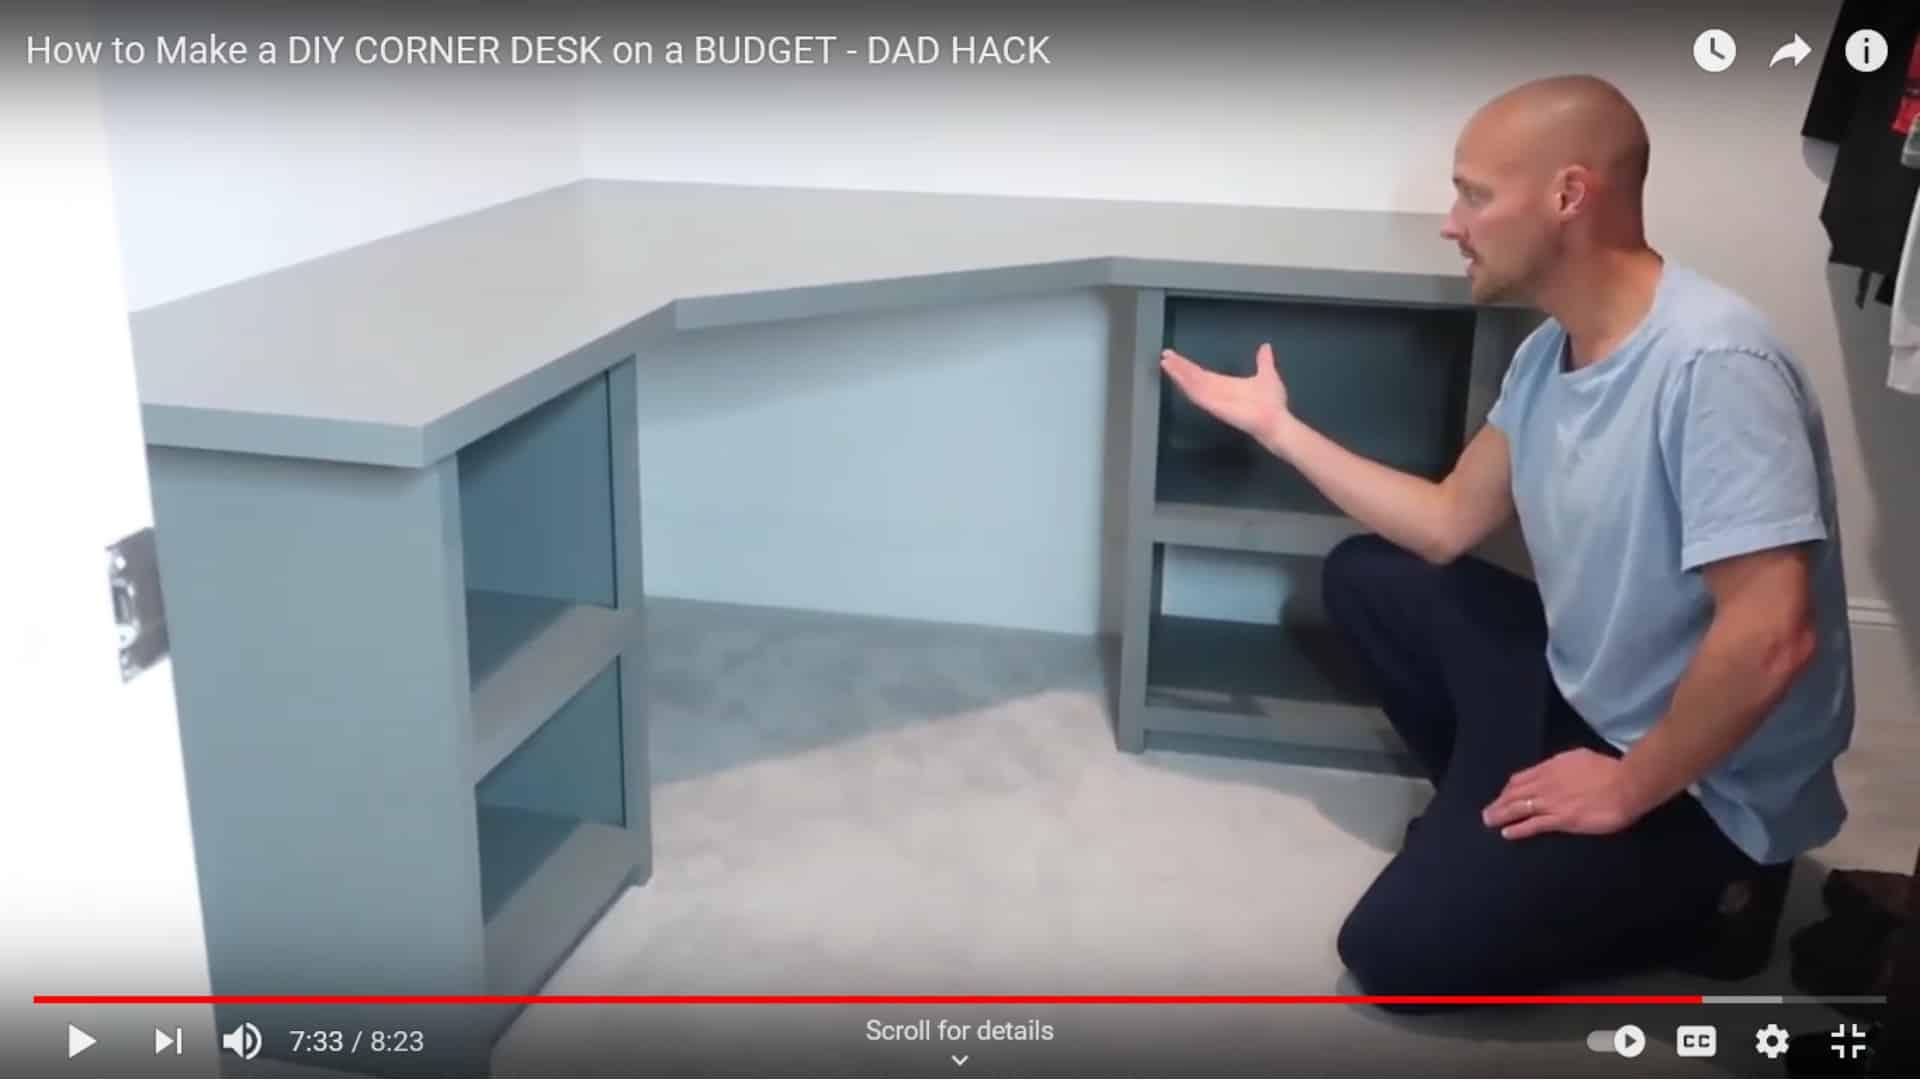 Budget-Friendly Corner Desk